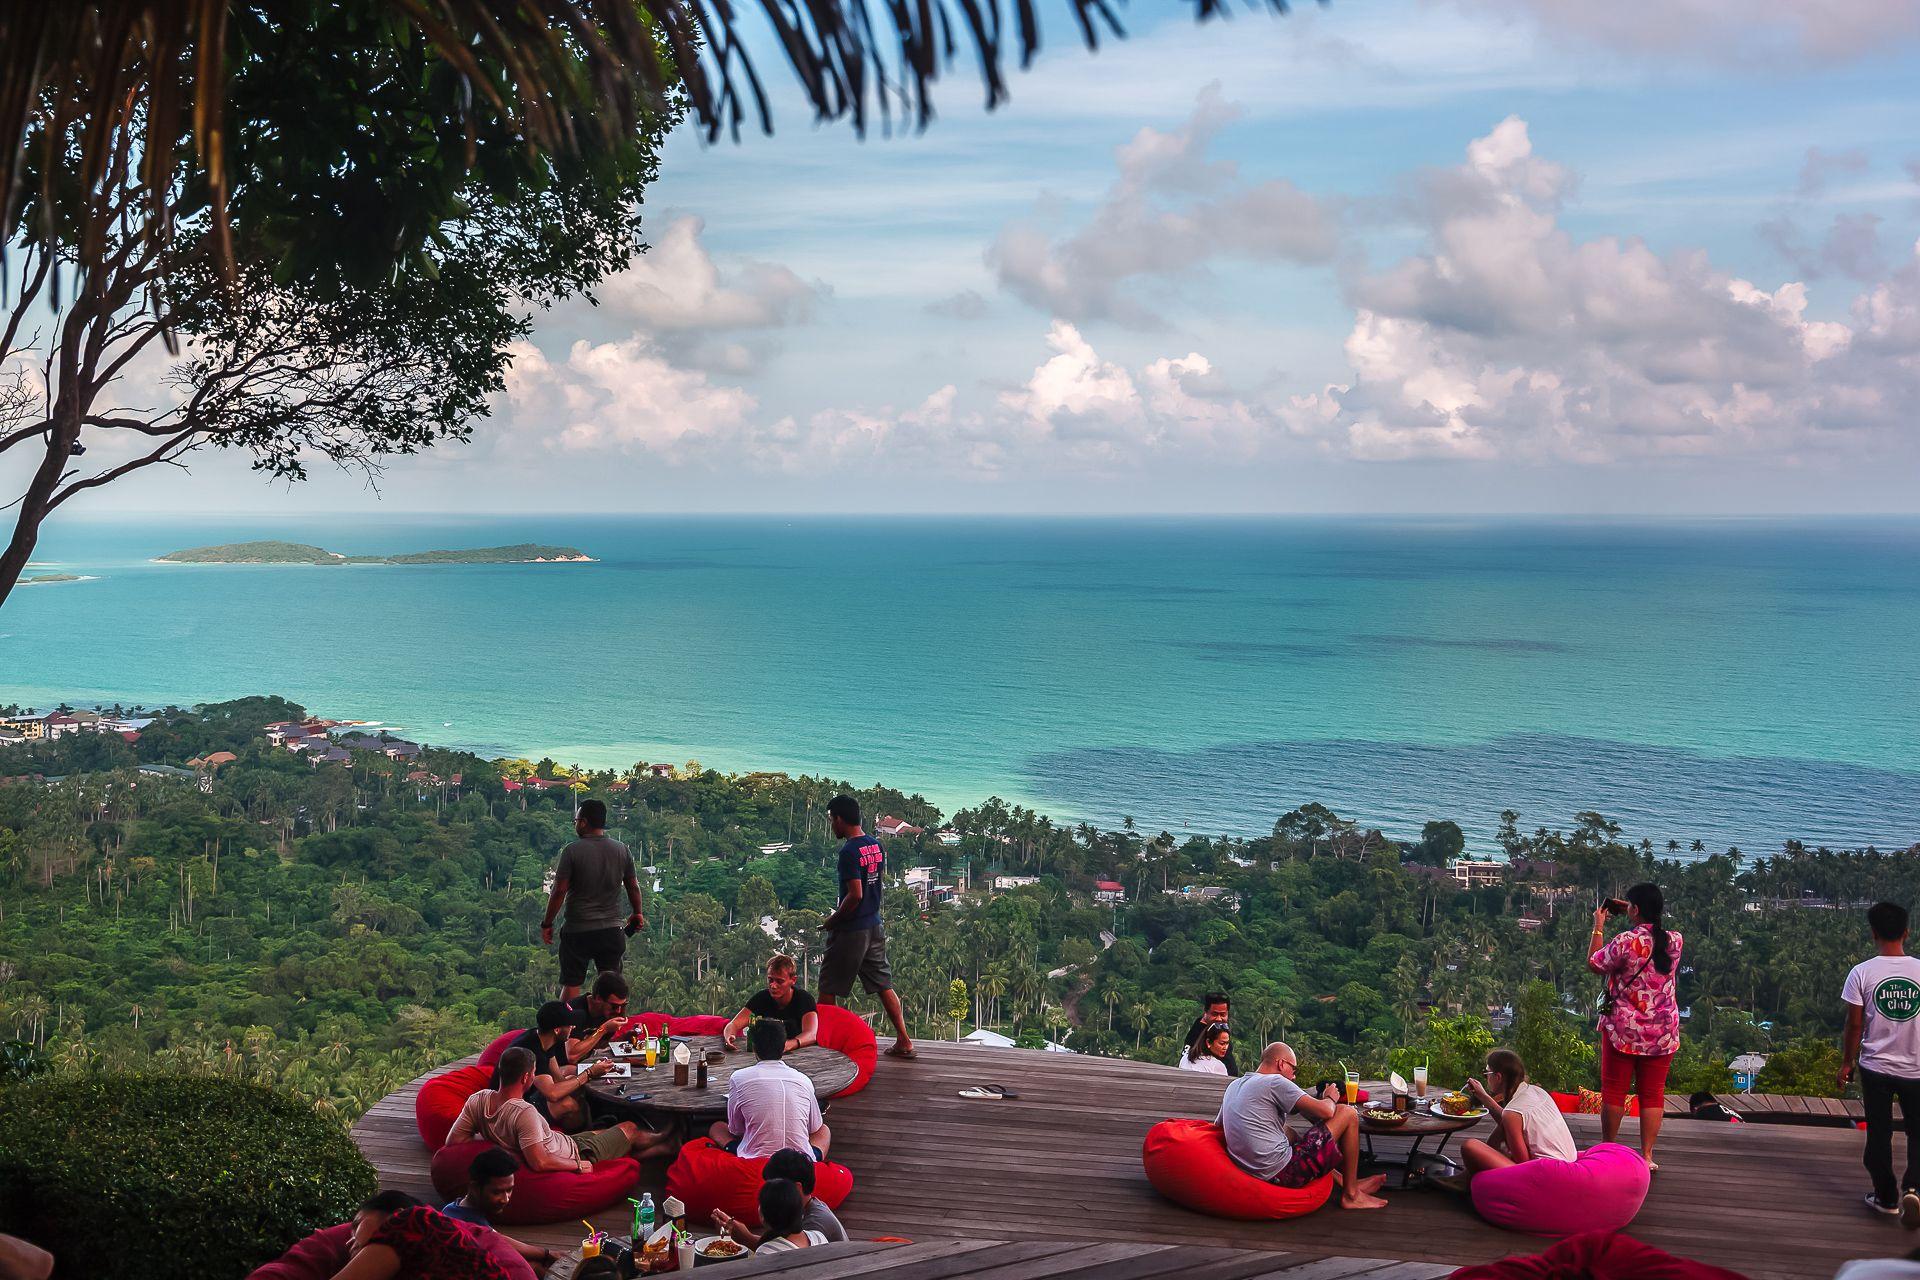 jungle club, Mountain, Grand View, Seaview Restaurant, view point, вьюпоинт, Смотровая площадка, Samui, Thailand, Самуи, тай, Тайланд, Таиланд, пляж, море, красота, отпуск, beach, sea, palms, Paradise, beauty, vacation,